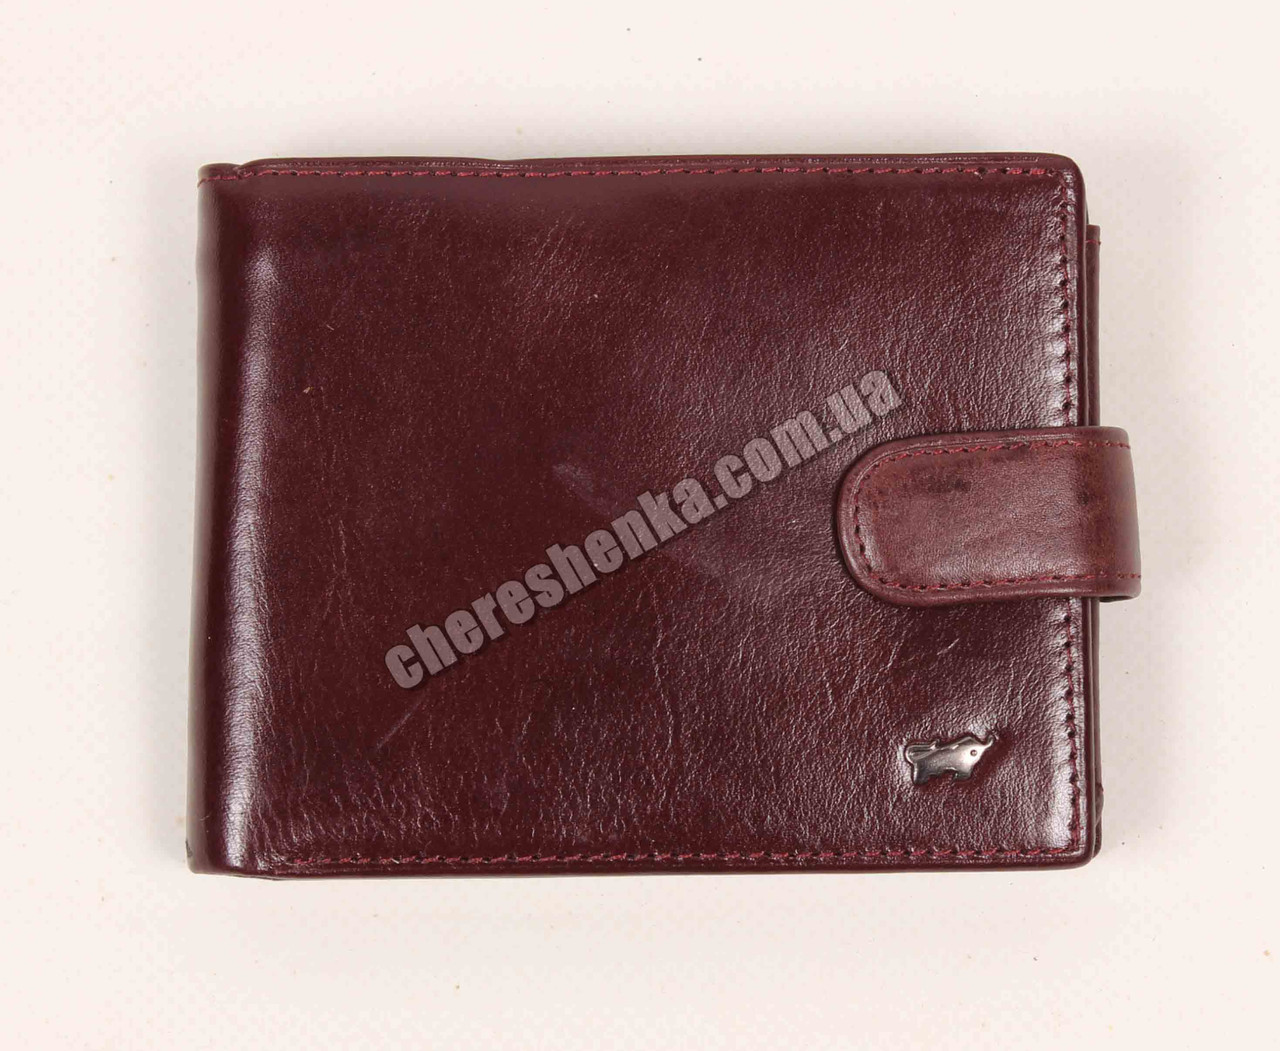 e1585e46aab2 Мужской кожаный кошелек Braun Buffel BR-603 Коричневый -